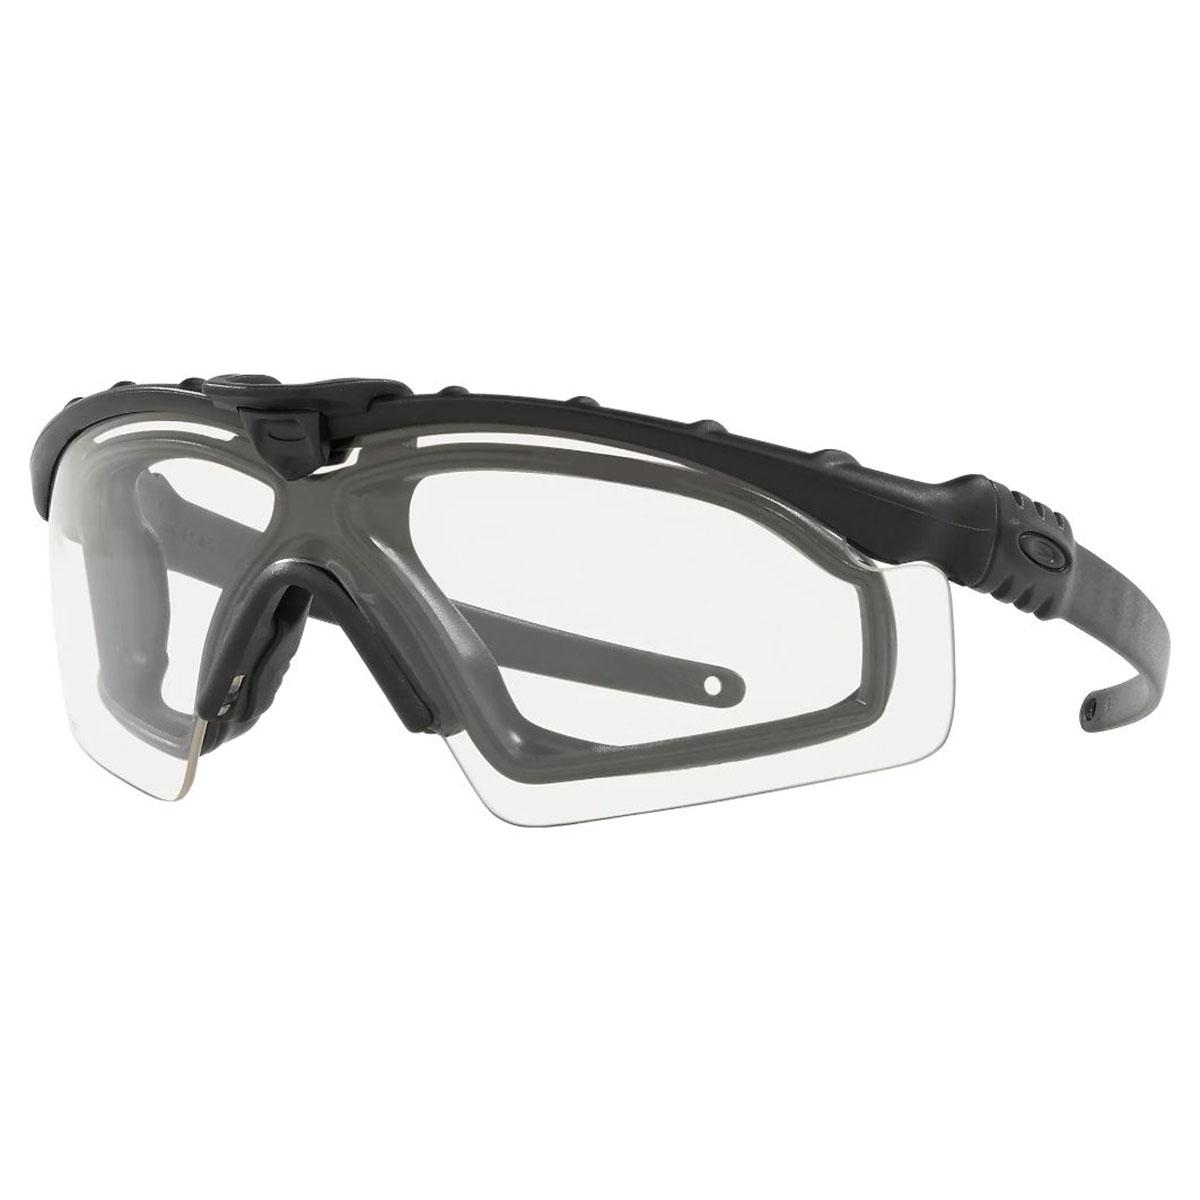 Óculos de Sol Oakley OO9146 Si Ballistic M Frame 3.0 Preto Fosco